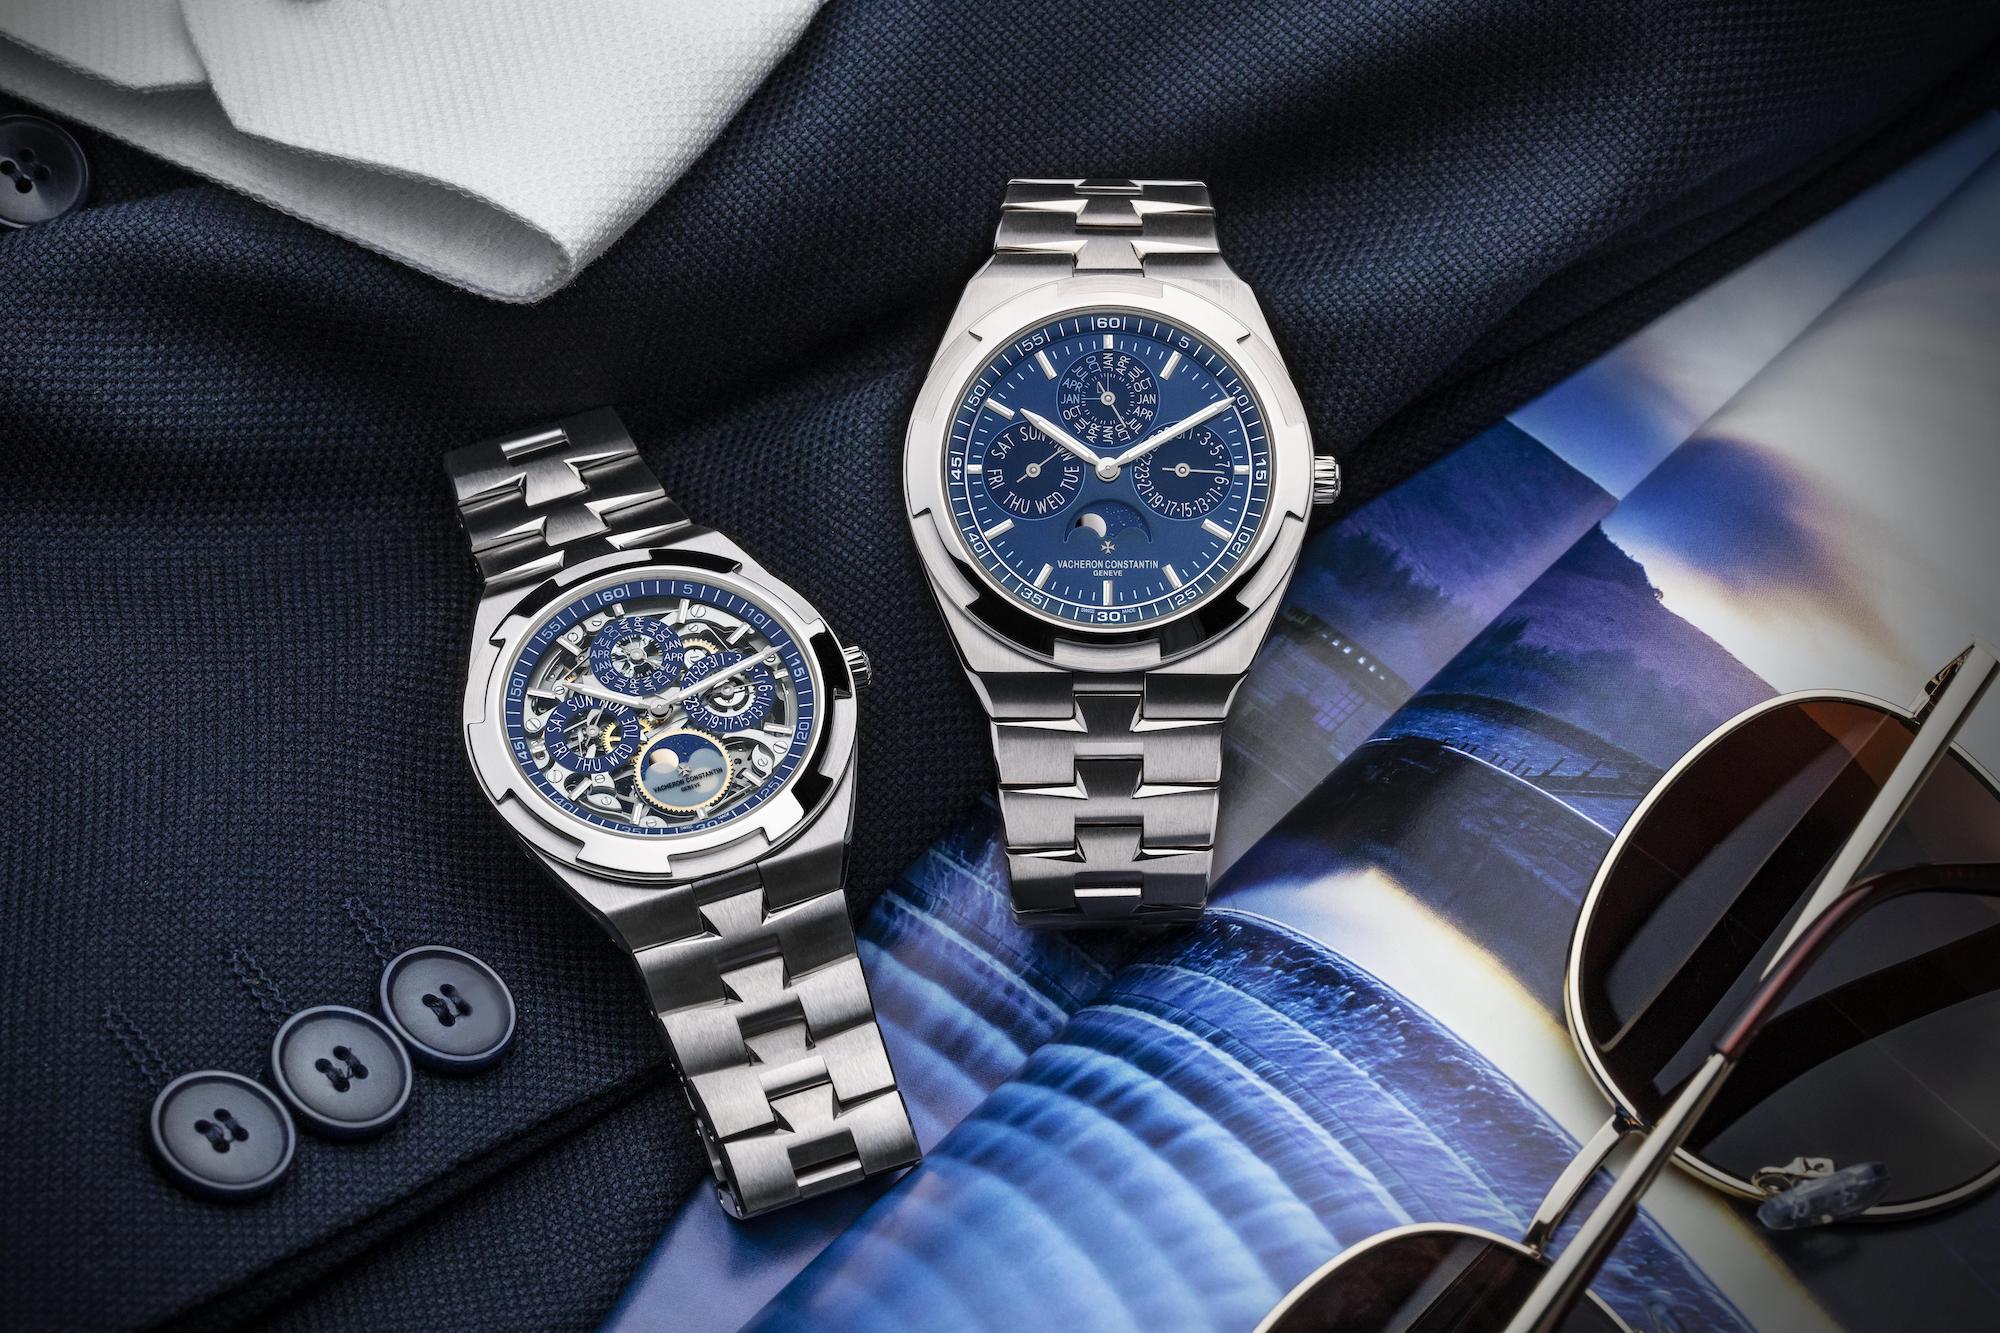 New Overseas Perpetual Calendar Ultra-Thin Is The Pinnacle Of Vacheron Constantin's Sport Luxury Range